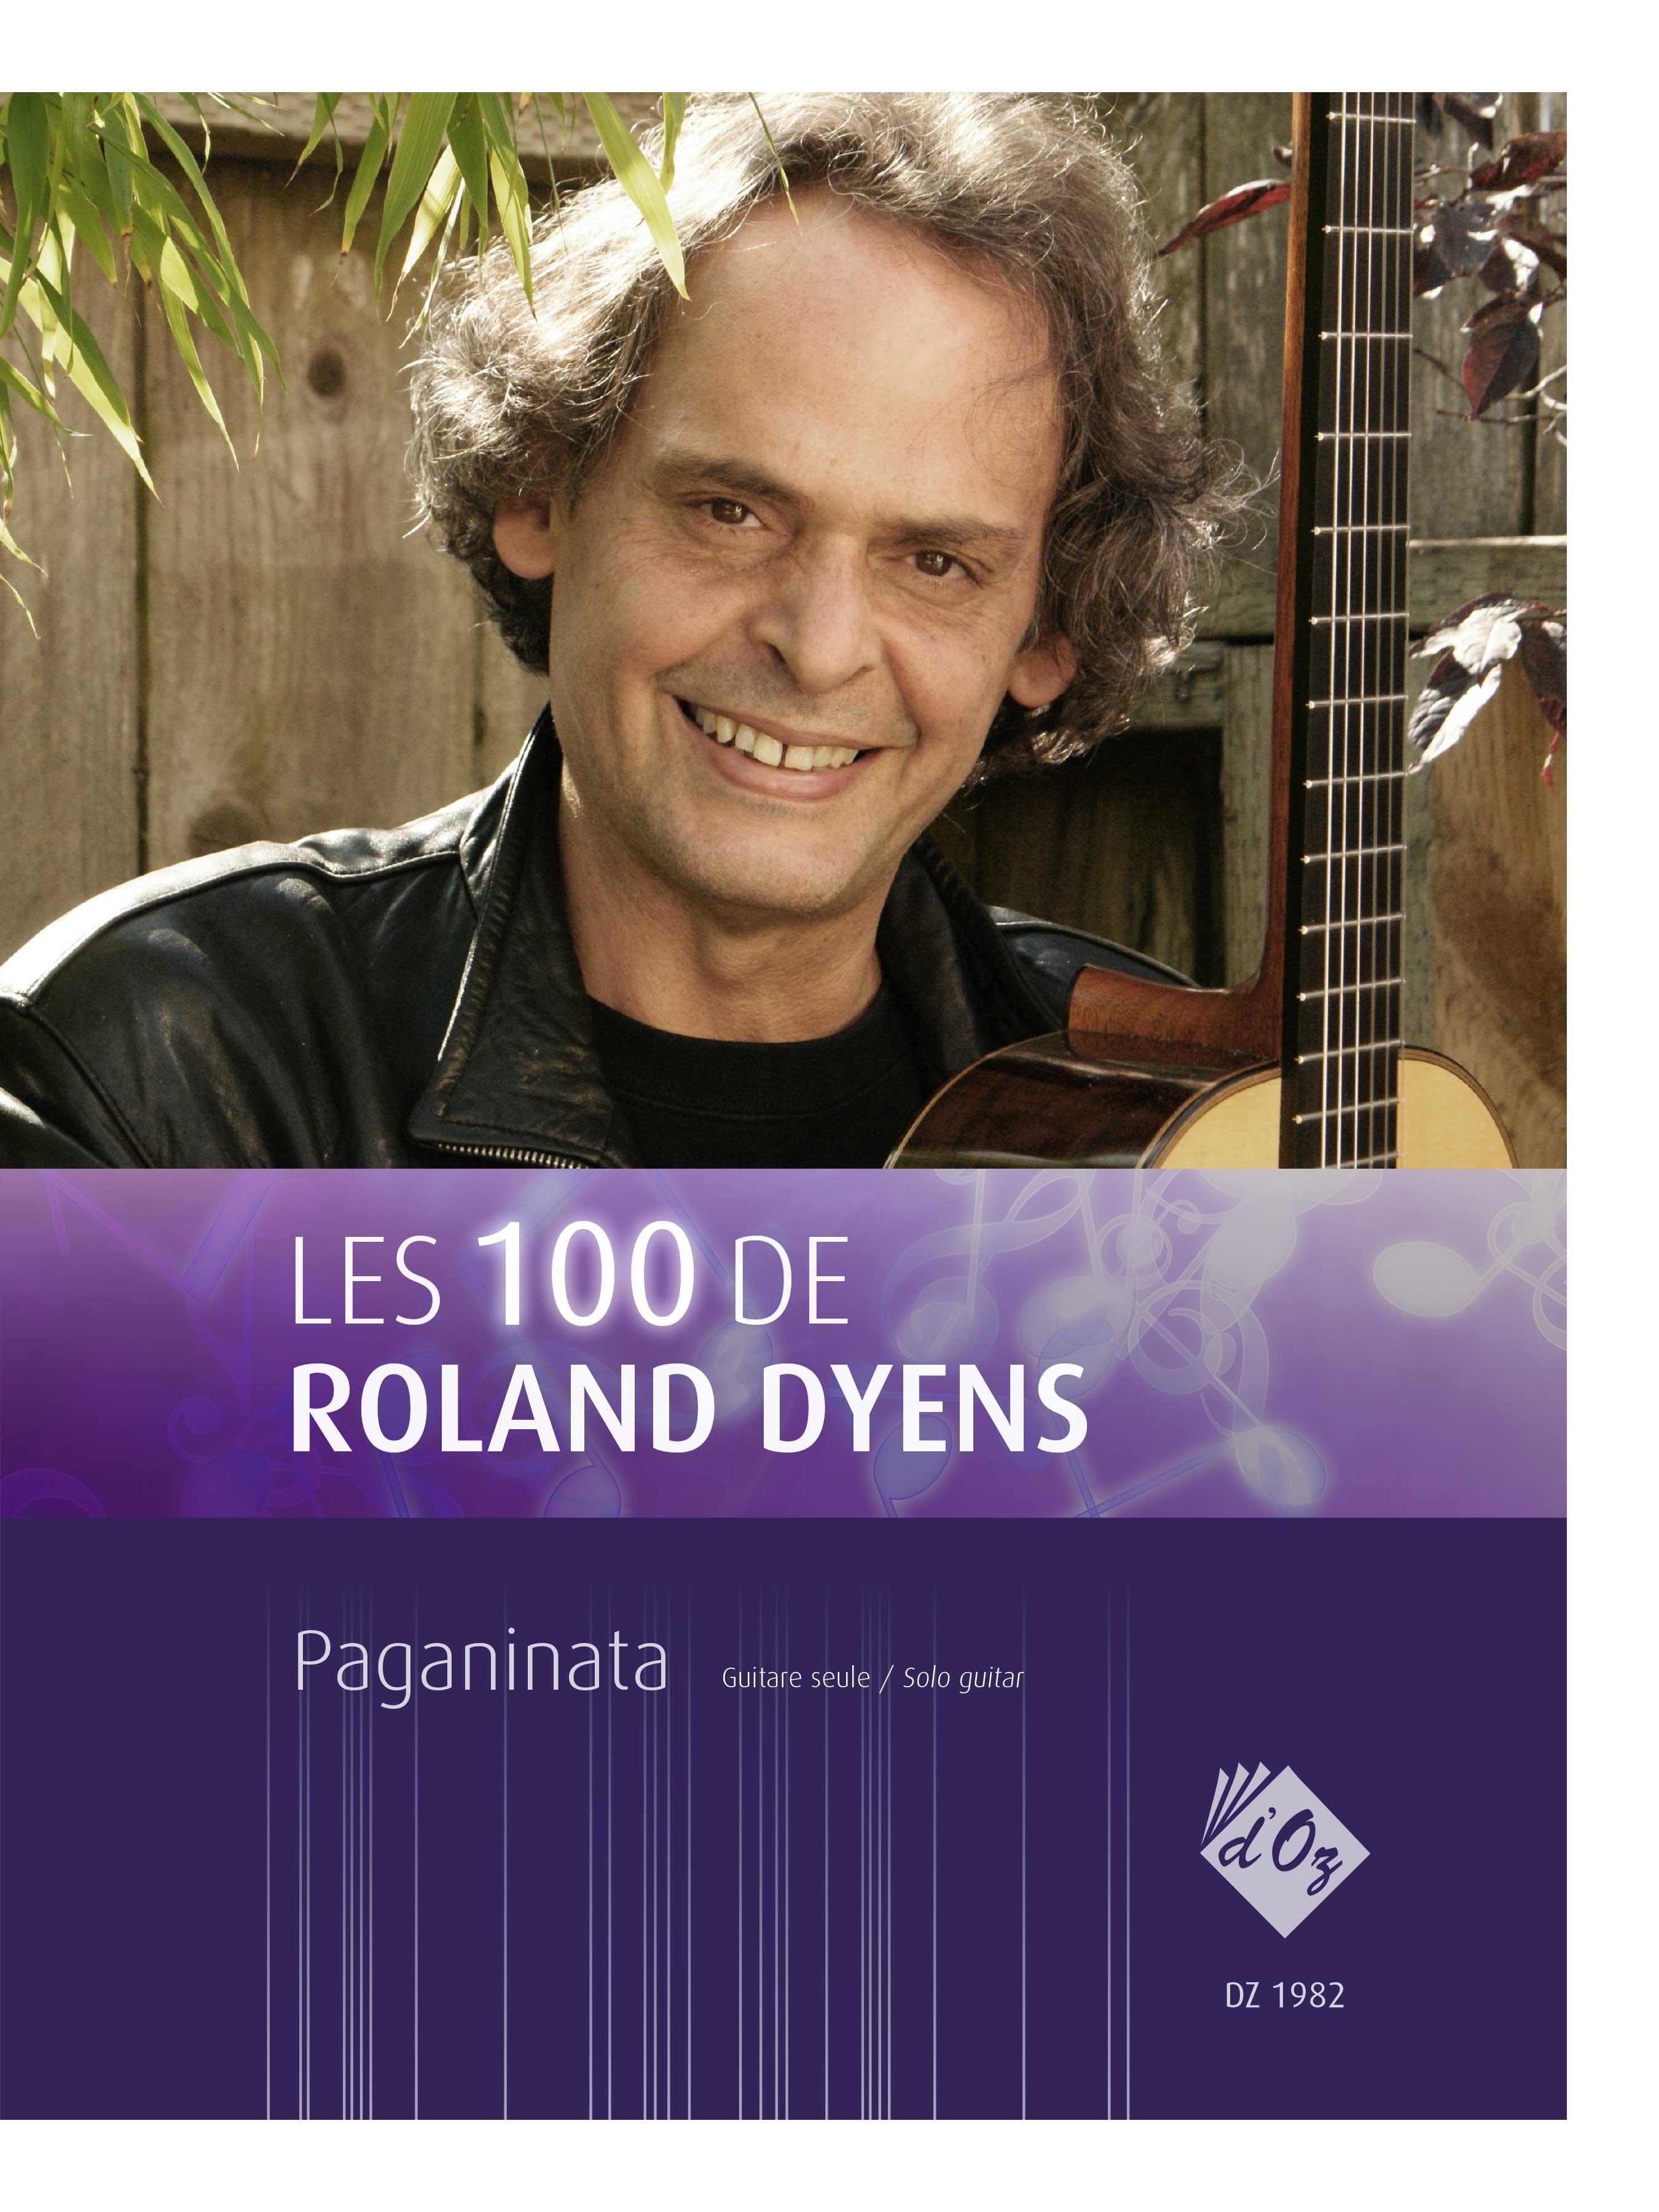 Les 100 de Roland Dyens - Paganinata